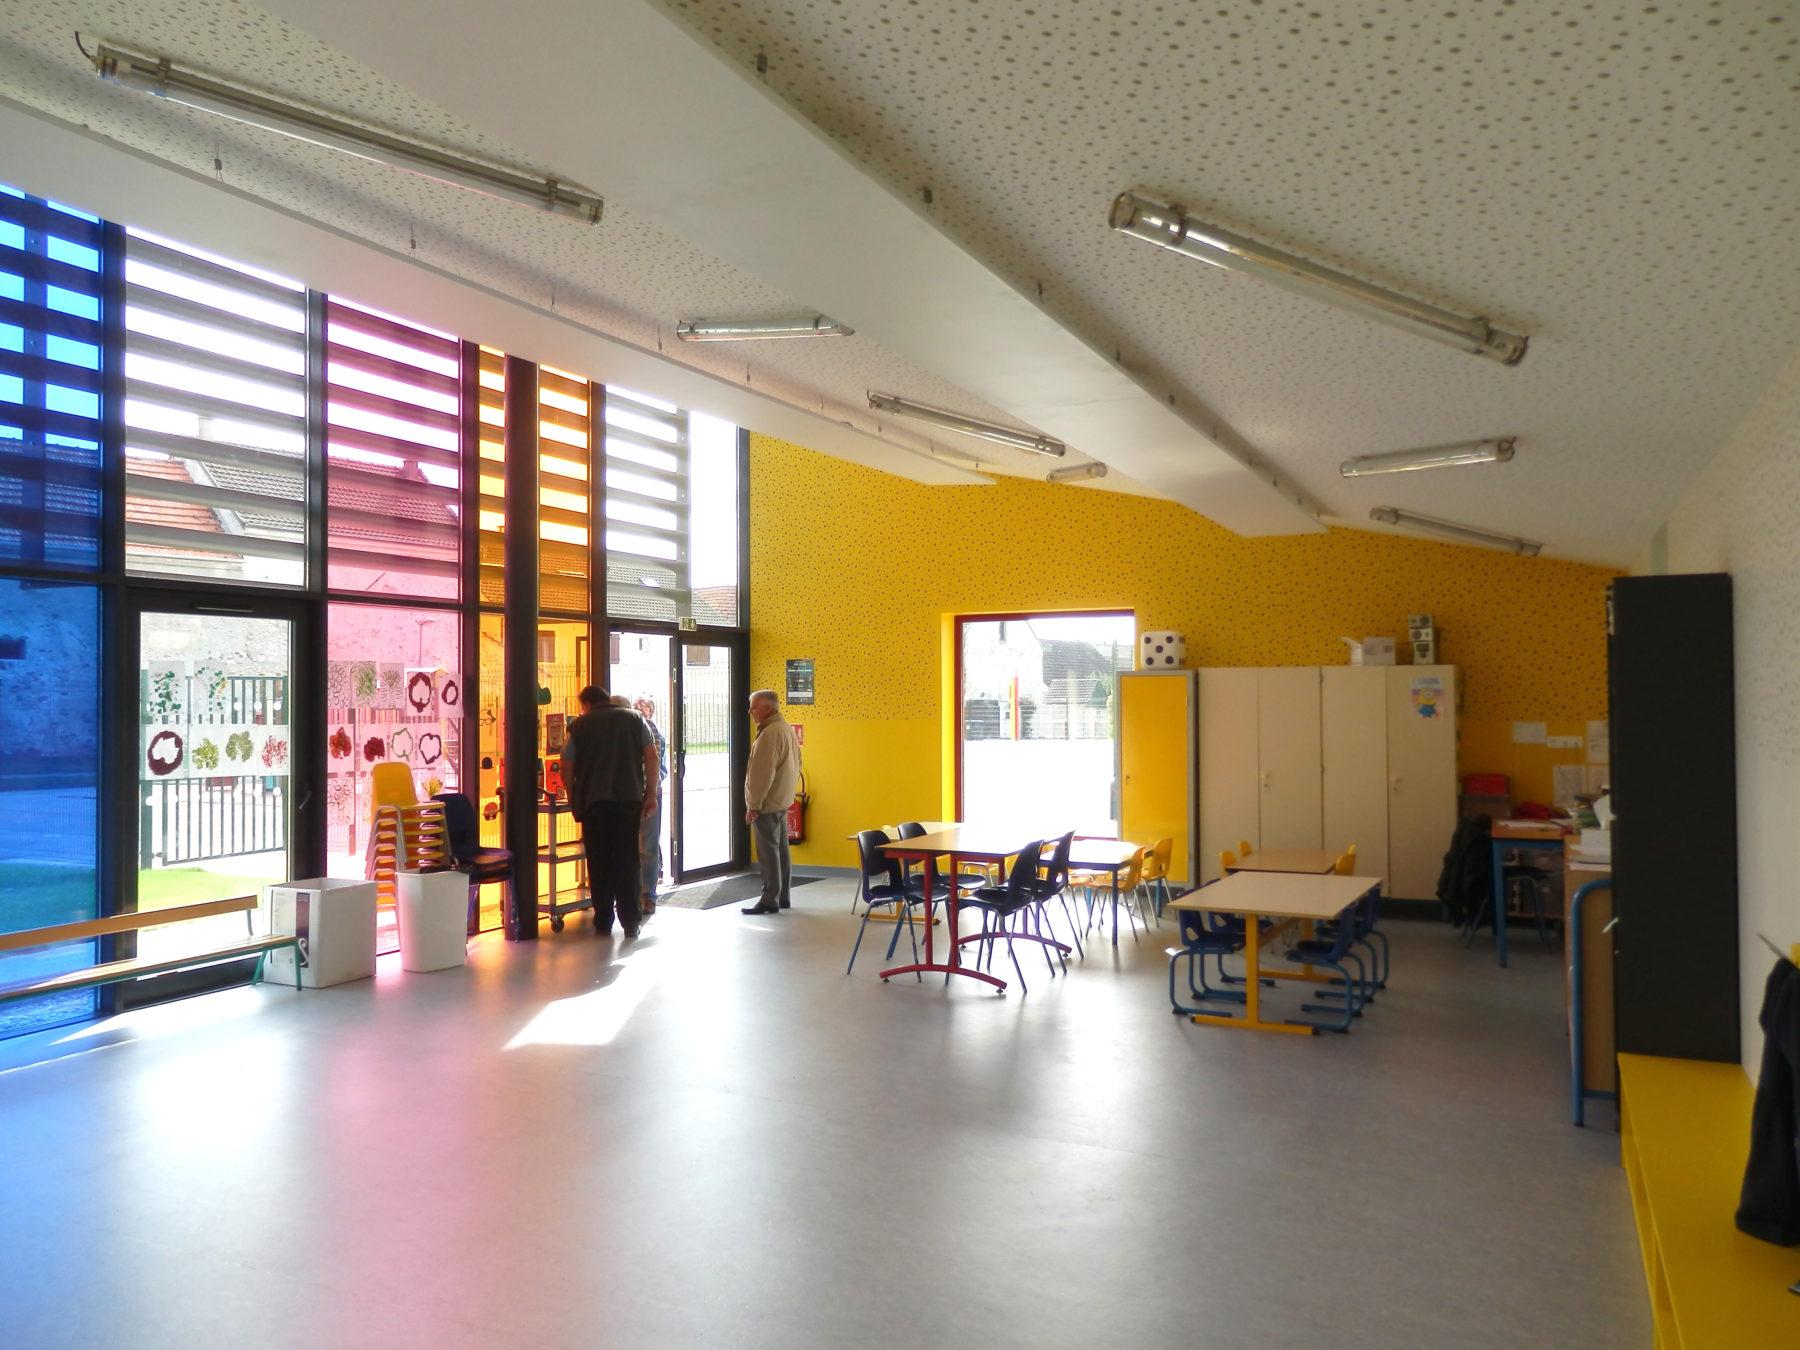 Salle périscolaire - Chambry